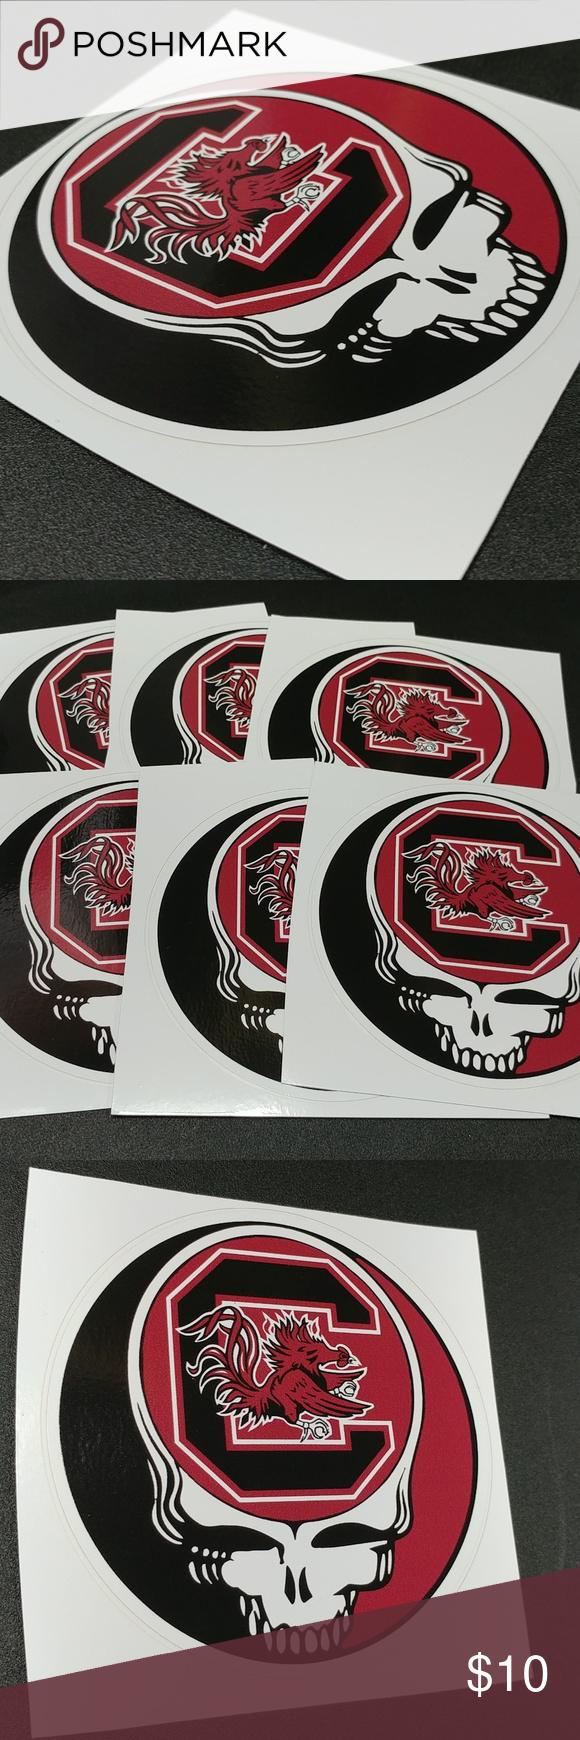 South Carolina Shield Sticker South Carolina Gift Bumper Stickers South Carolina [ 1106 x 1106 Pixel ]